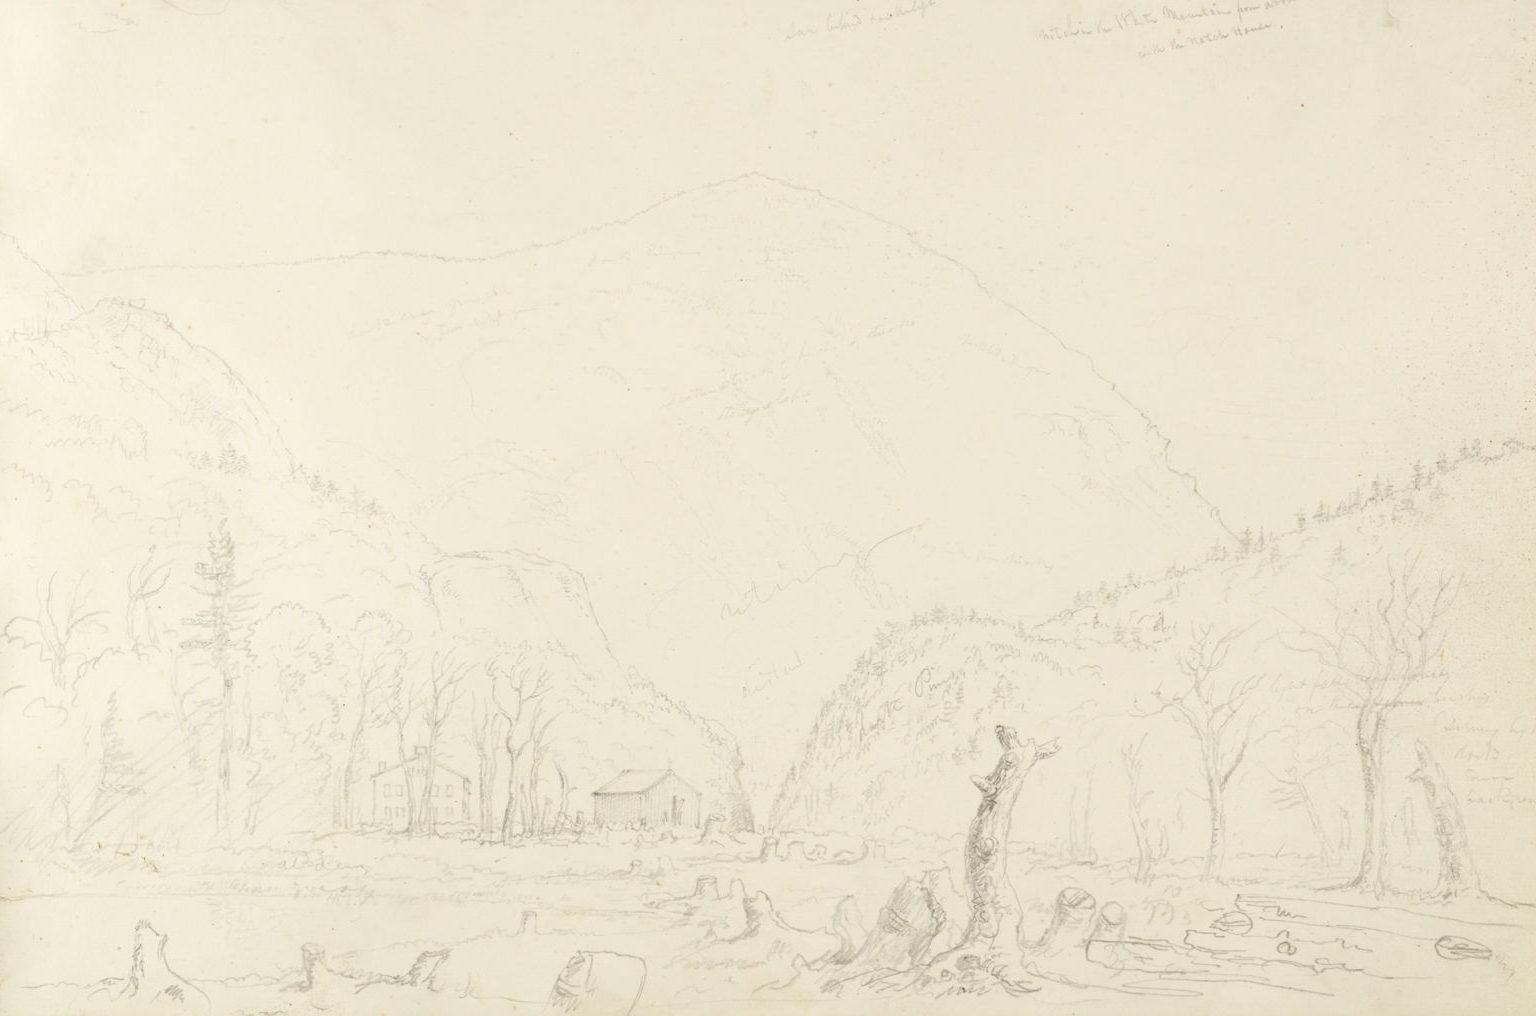 Graphite sketch by Thomas Cole